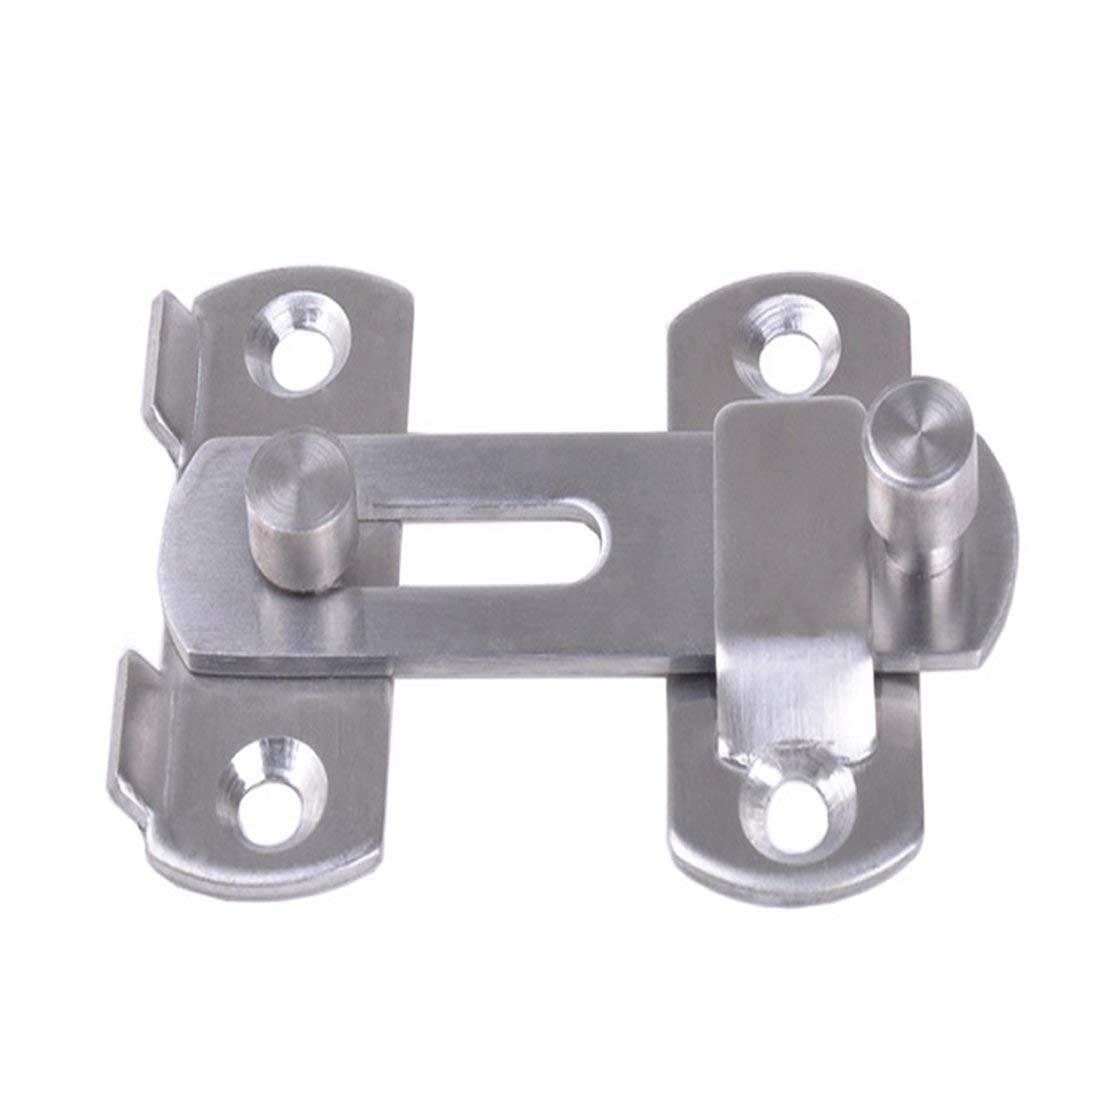 Hasp Latch METAL Hasp Latch Lock Sliding Door Lock for Window Cabinet FittingHasp Latch METAL Hasp Latch Lock Sliding Door Lock for Window Cabinet Fitting